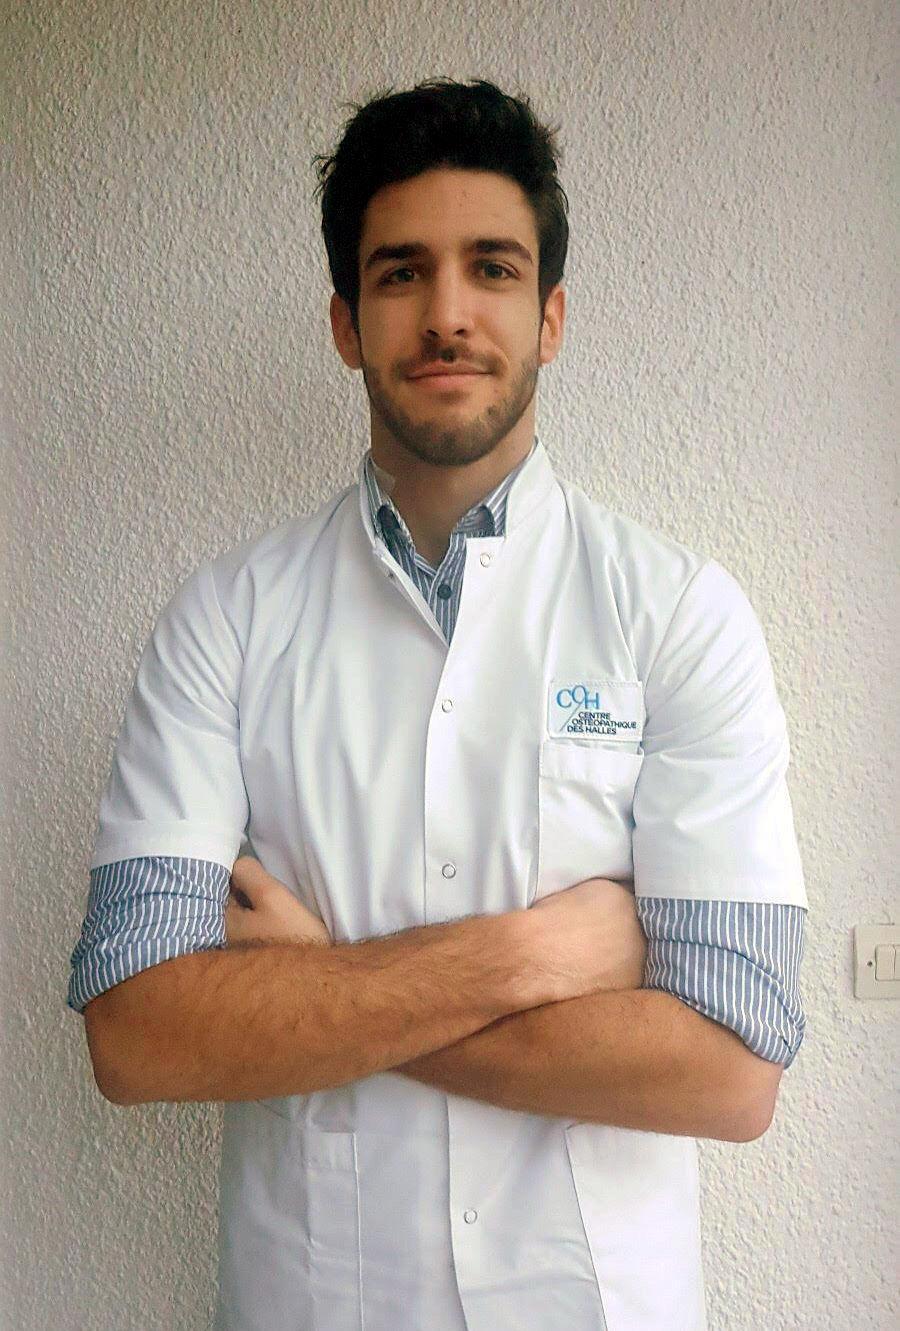 Osteoparis Romain Maques